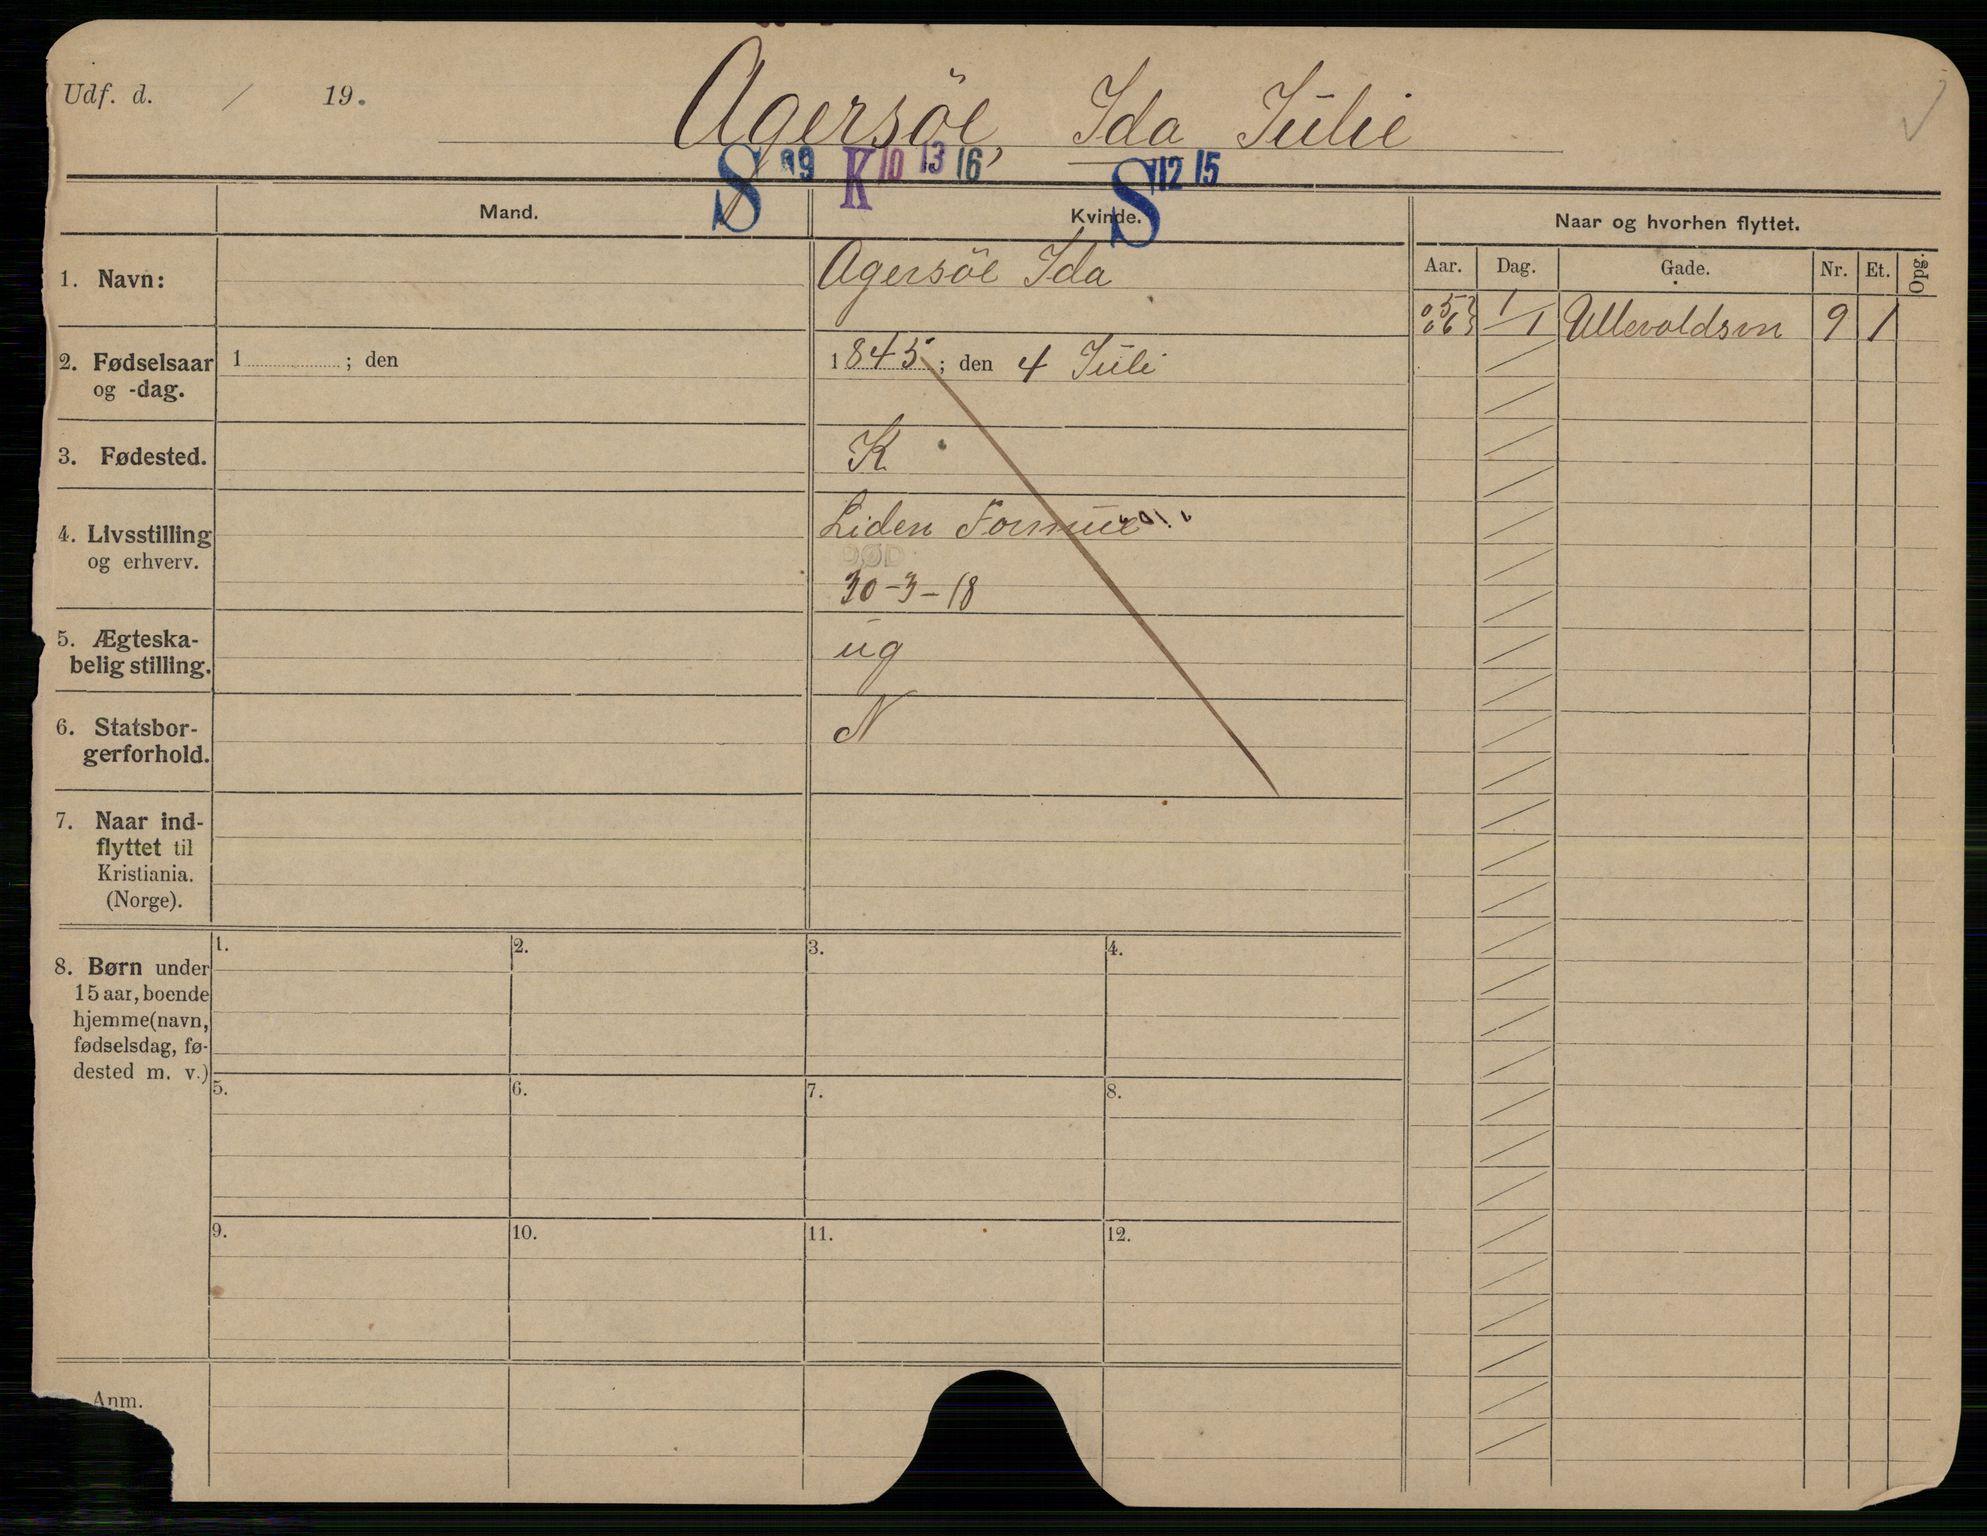 SAO, Oslo folkeregister, Registerkort, G/Gb/L0026: Kvinner, 1918